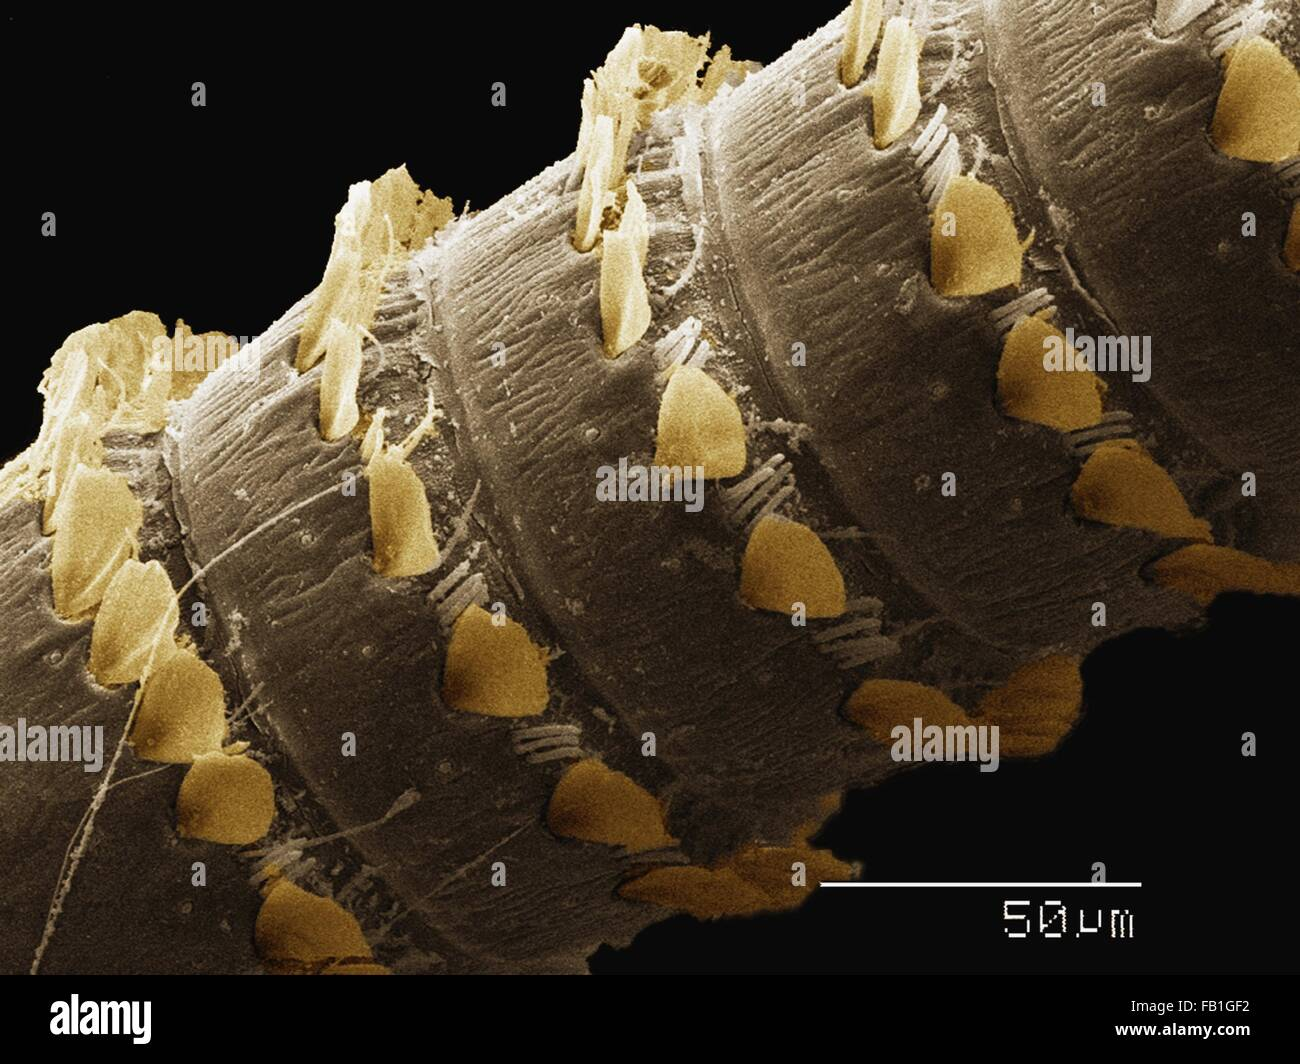 Coloured SEM of antenna of Plecoptera (Peltoperlidae) - Stock Image